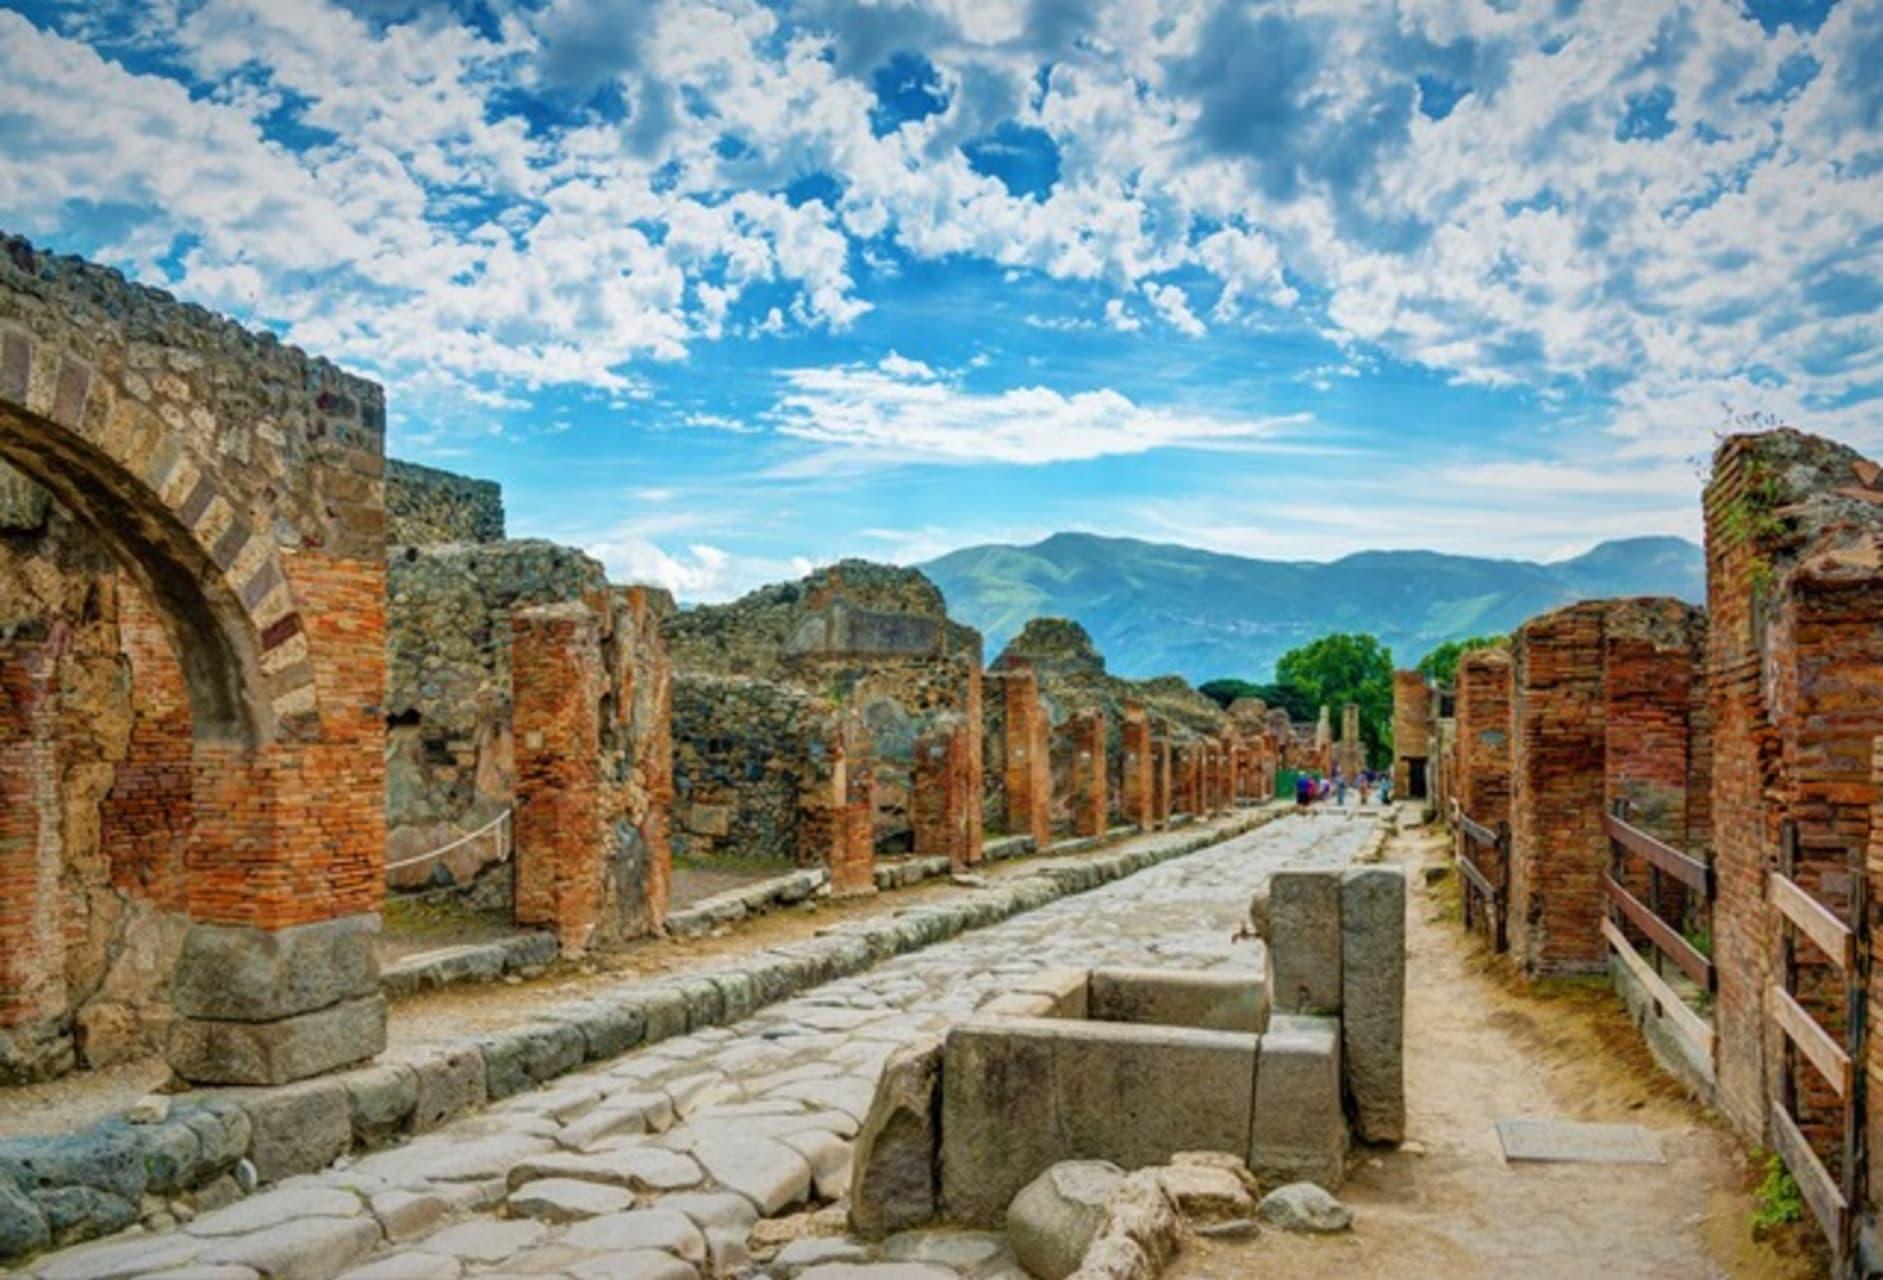 Pompeii and  Herculaneum - Pompeii the Upper Class Area: Patricians Lifestyle